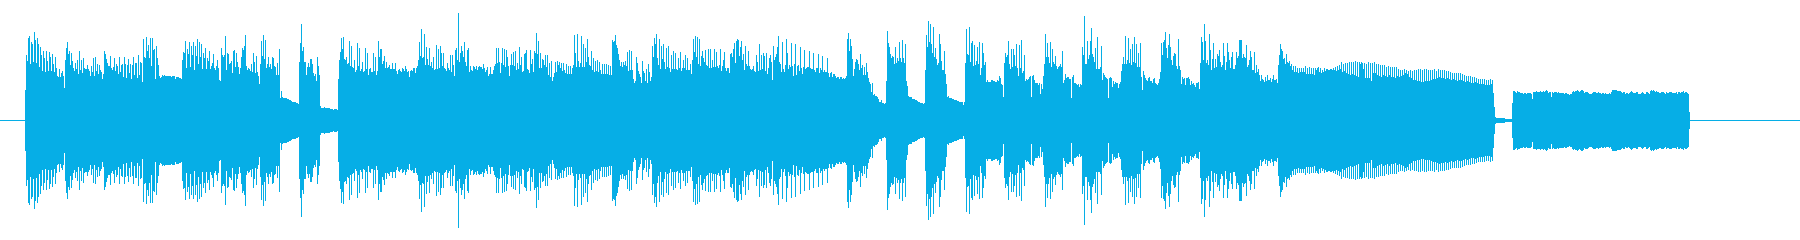 NES STG C07-1(クリア1)の再生済みの波形